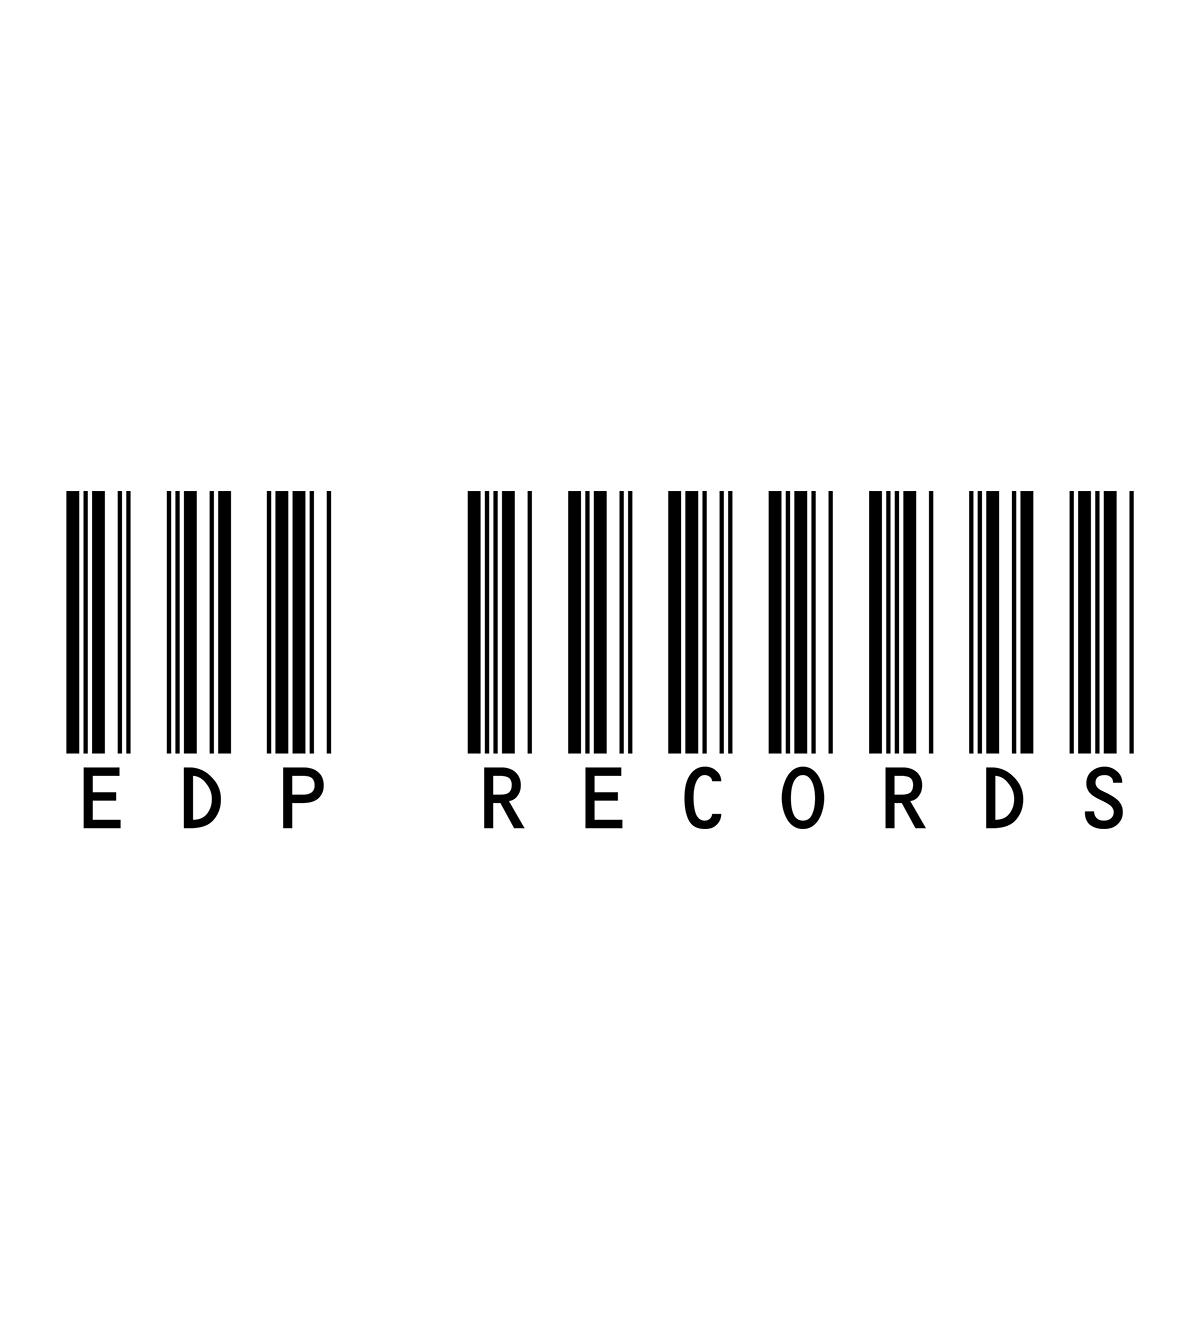 EDP Records Barcode Black